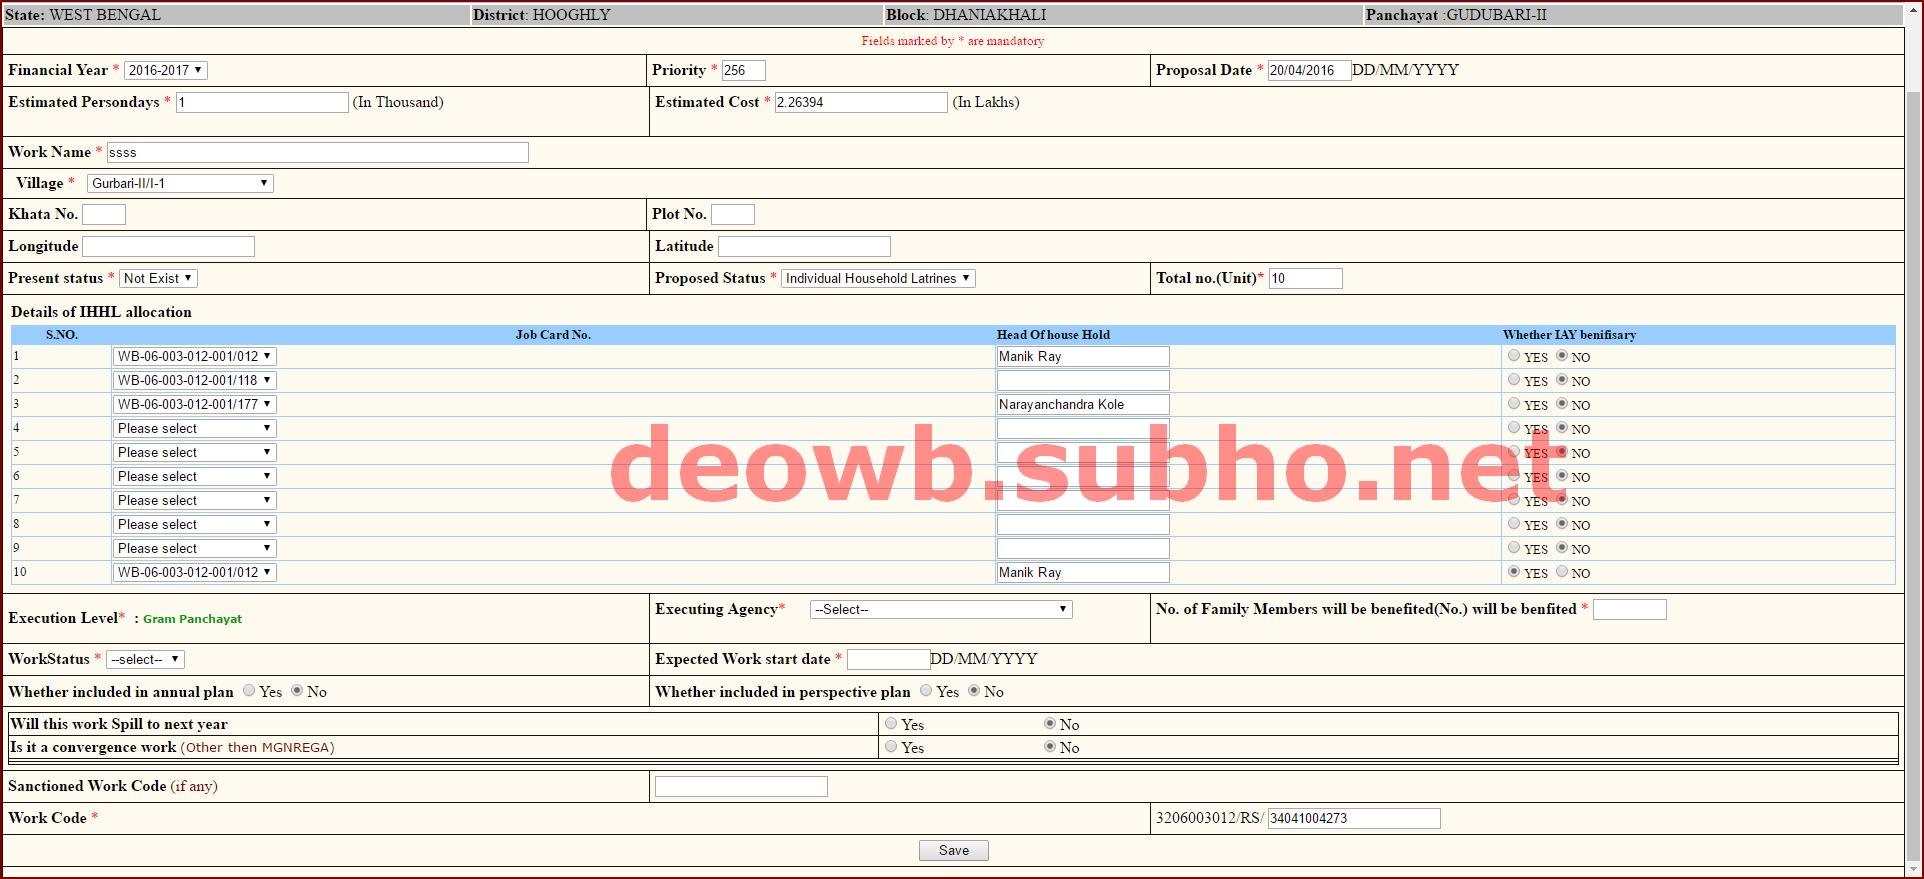 Search in IHHL scheme entry